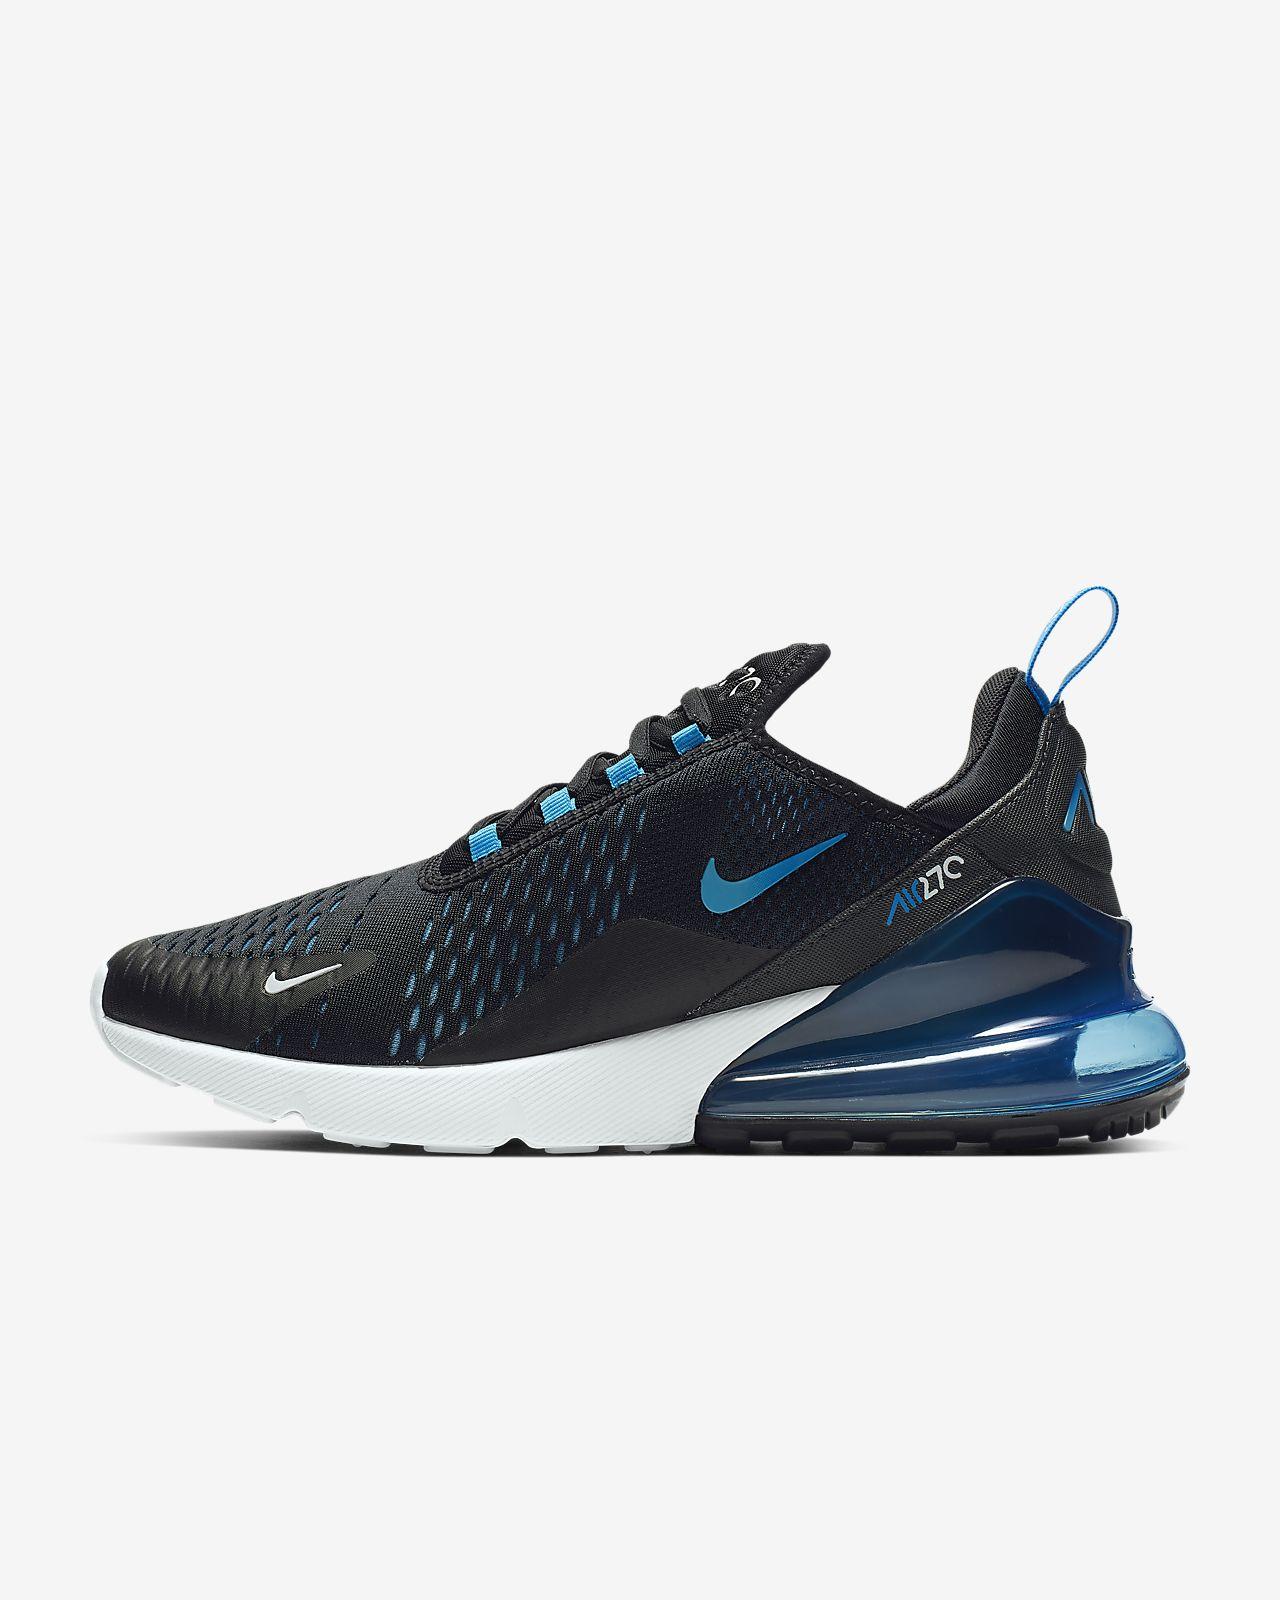 13ef00ea98d8f Chaussure Nike Air Max 270 pour Homme. Nike.com CH